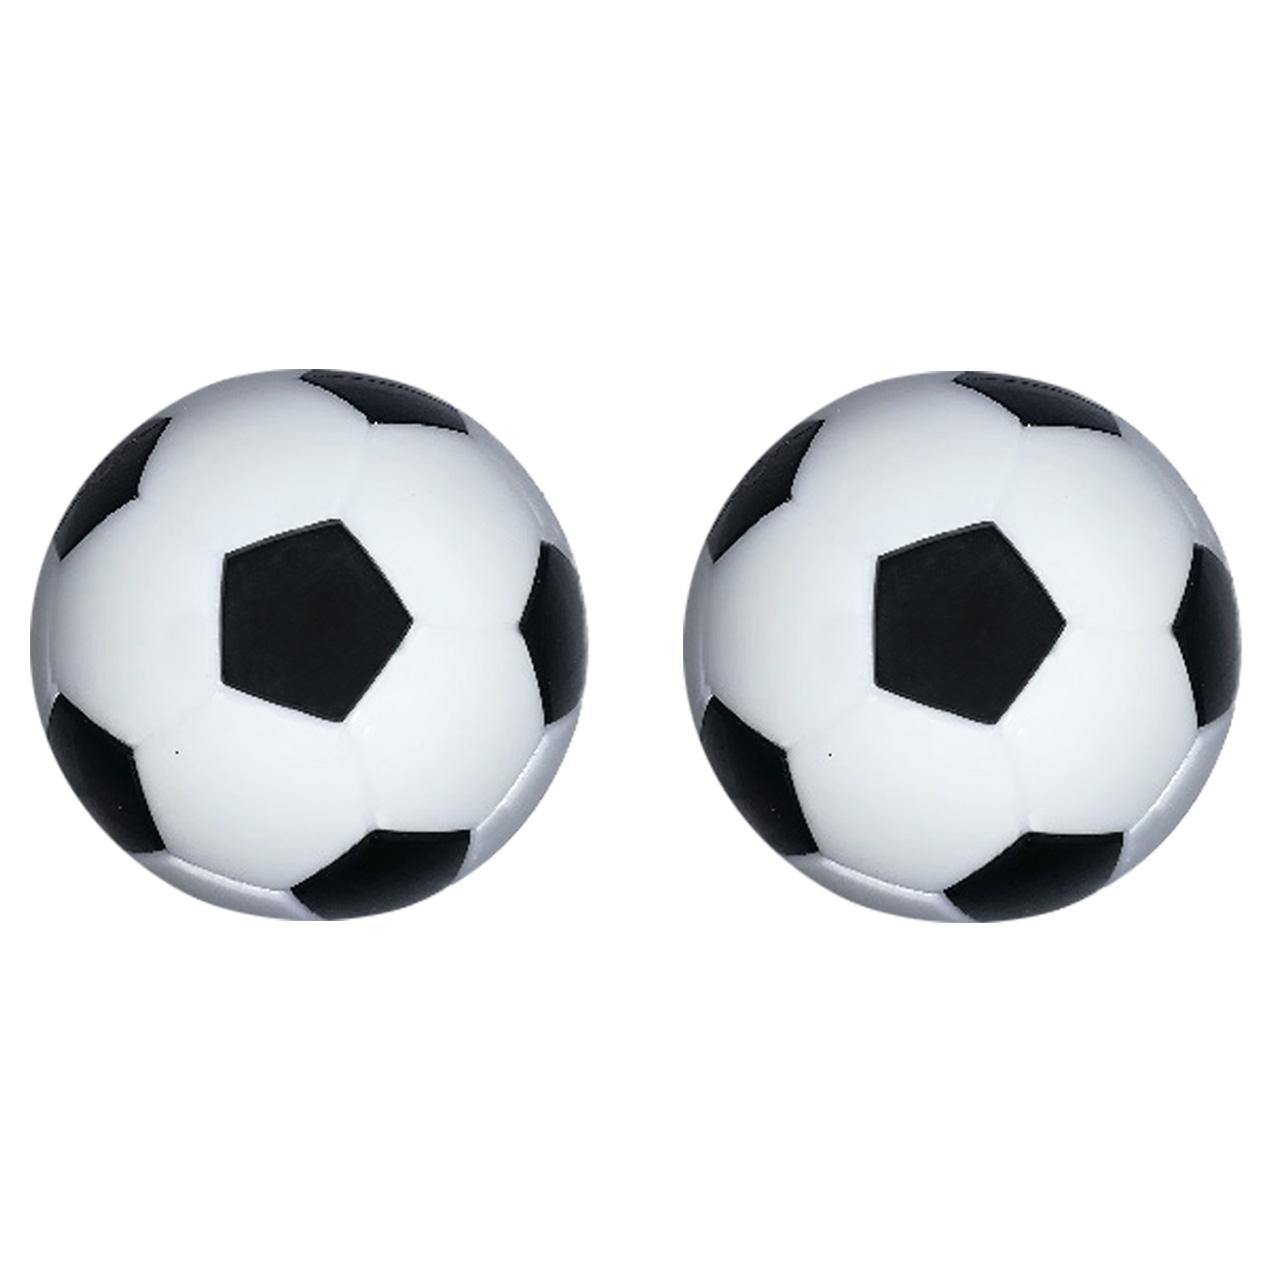 توپ فوتبال دستی مدل Morpel بسته دو عددی